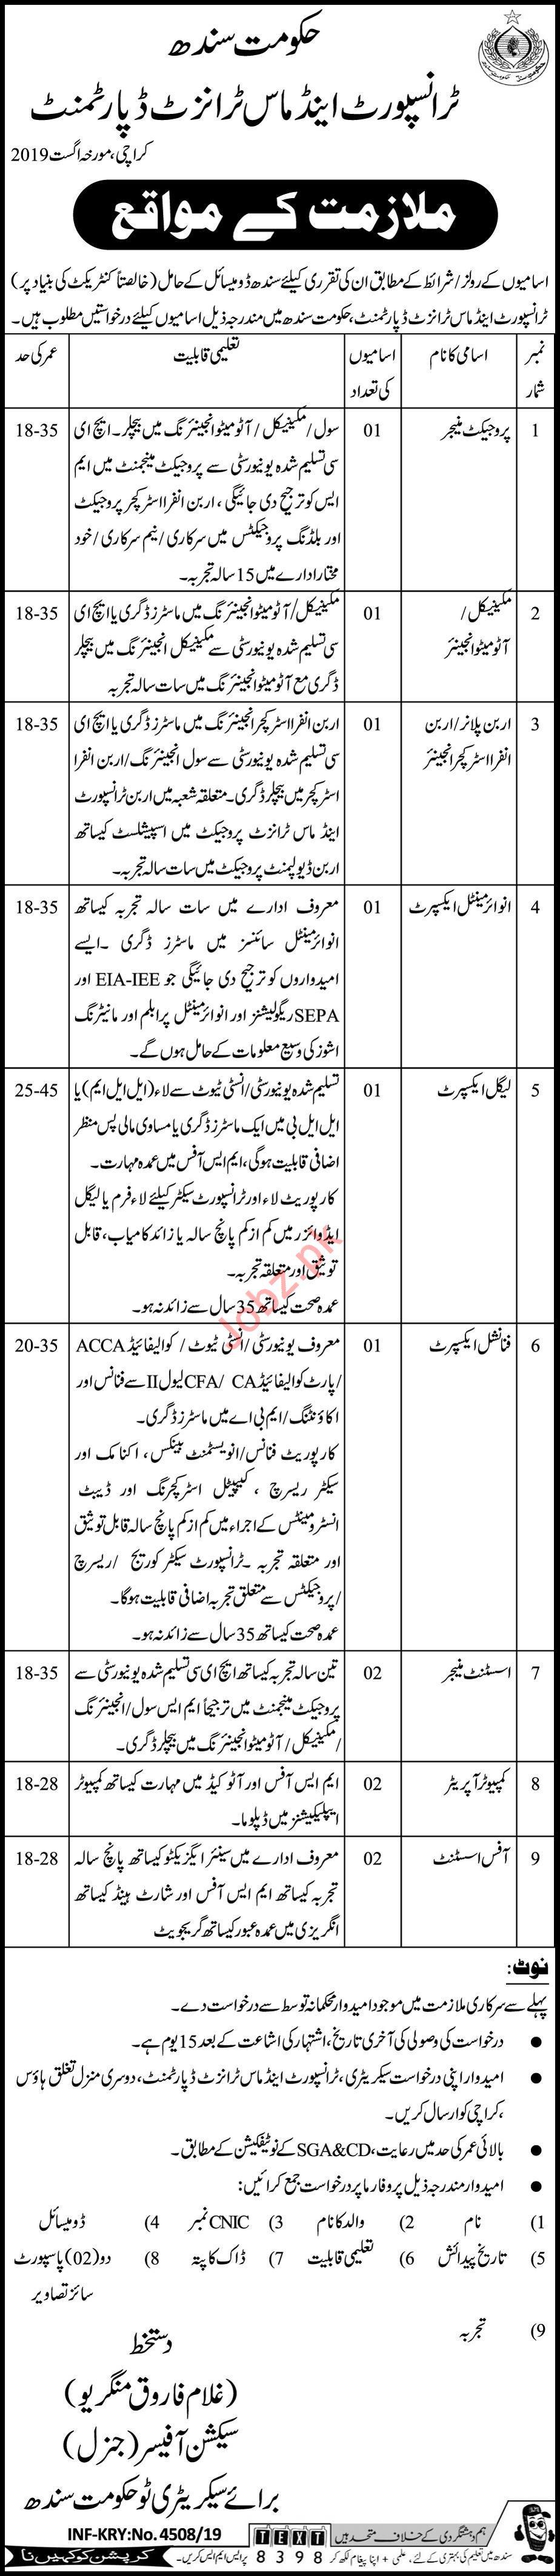 Transport & Mass Transit Department Jobs in Karachi